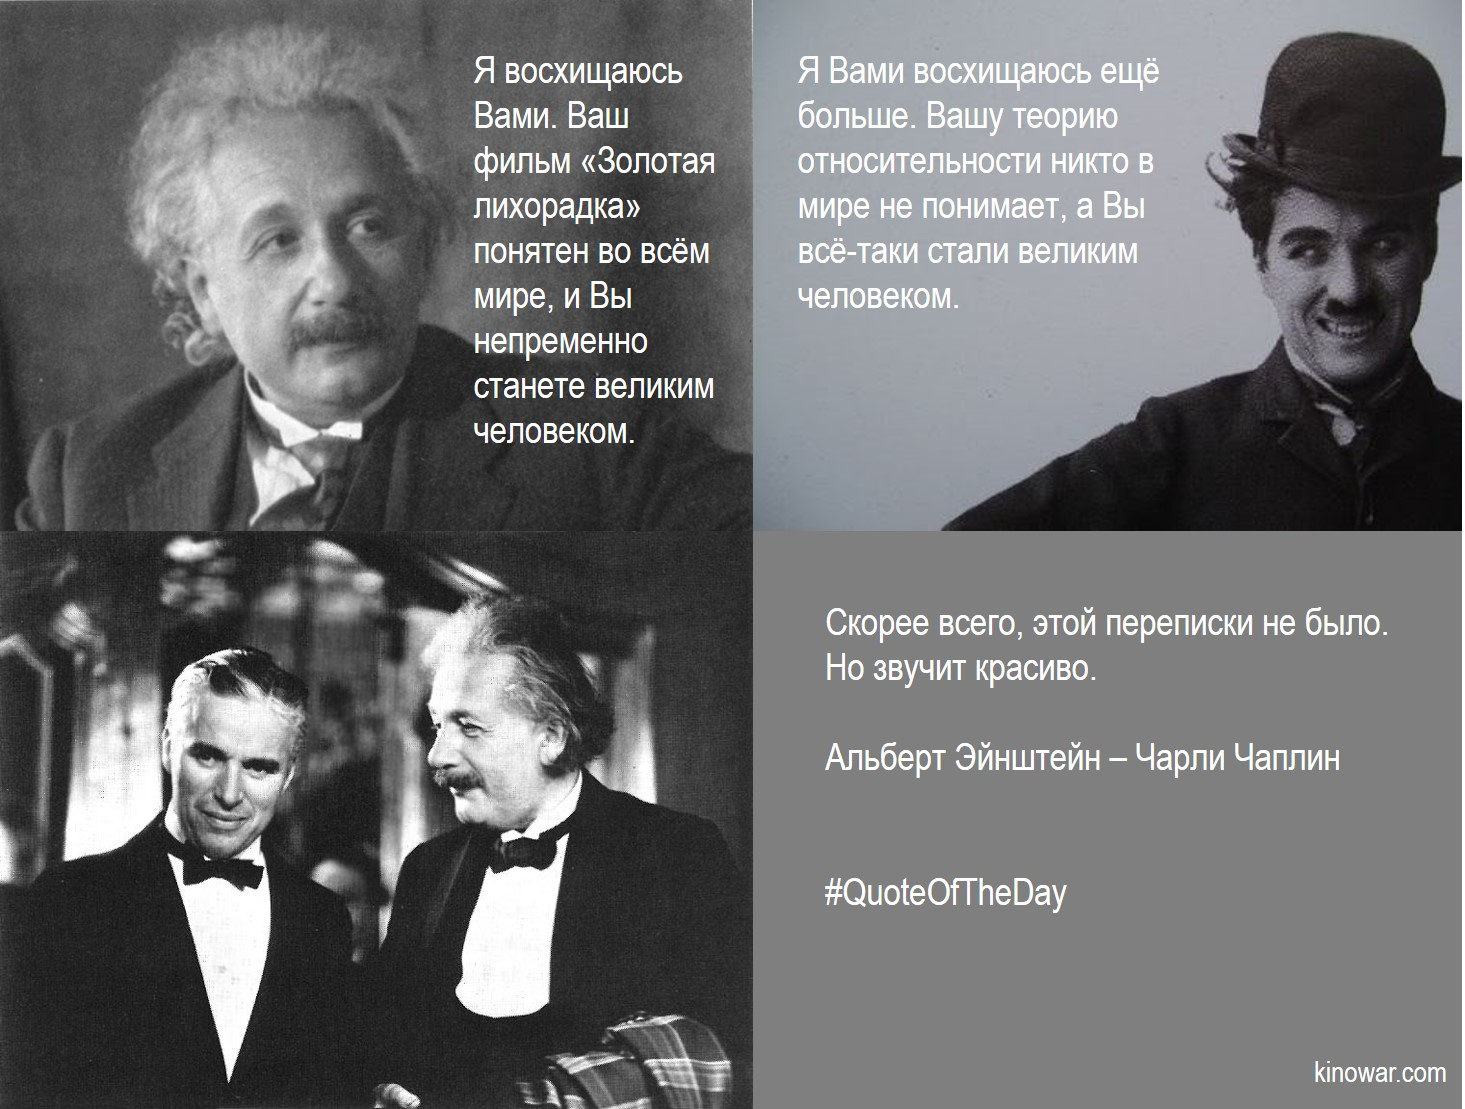 Цитата дня kinowar.com Чарли Чаплин Альберт Эйнштейн